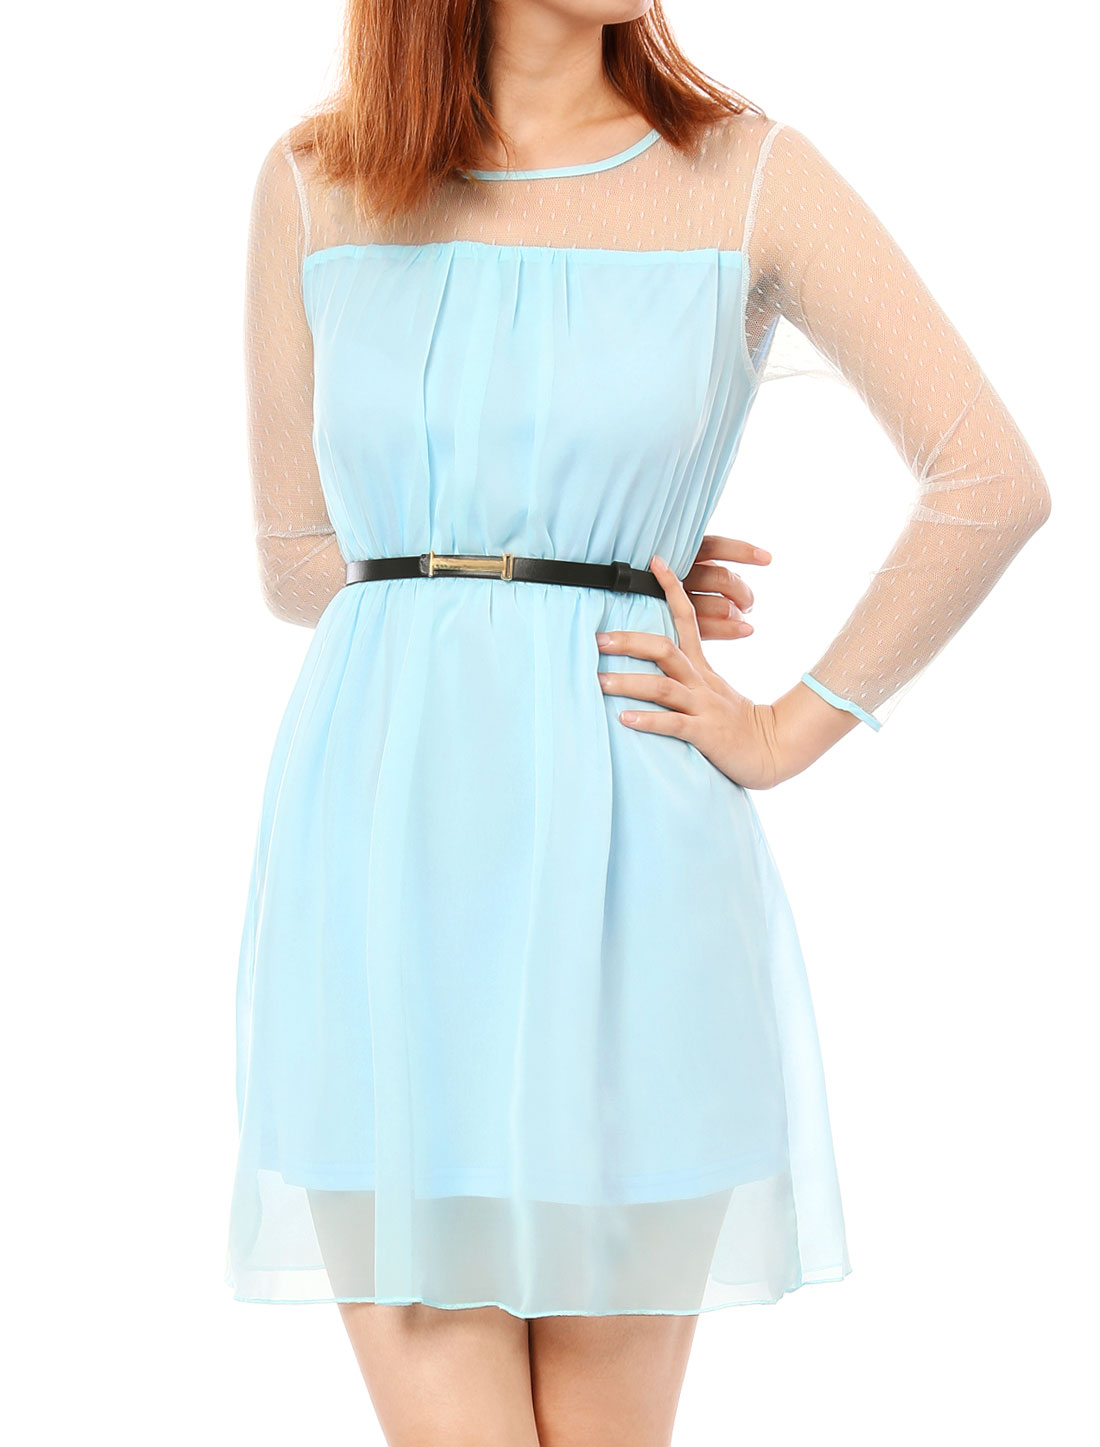 Lady Light Blue Splice Elastic Waist Design Above Knee Dress M